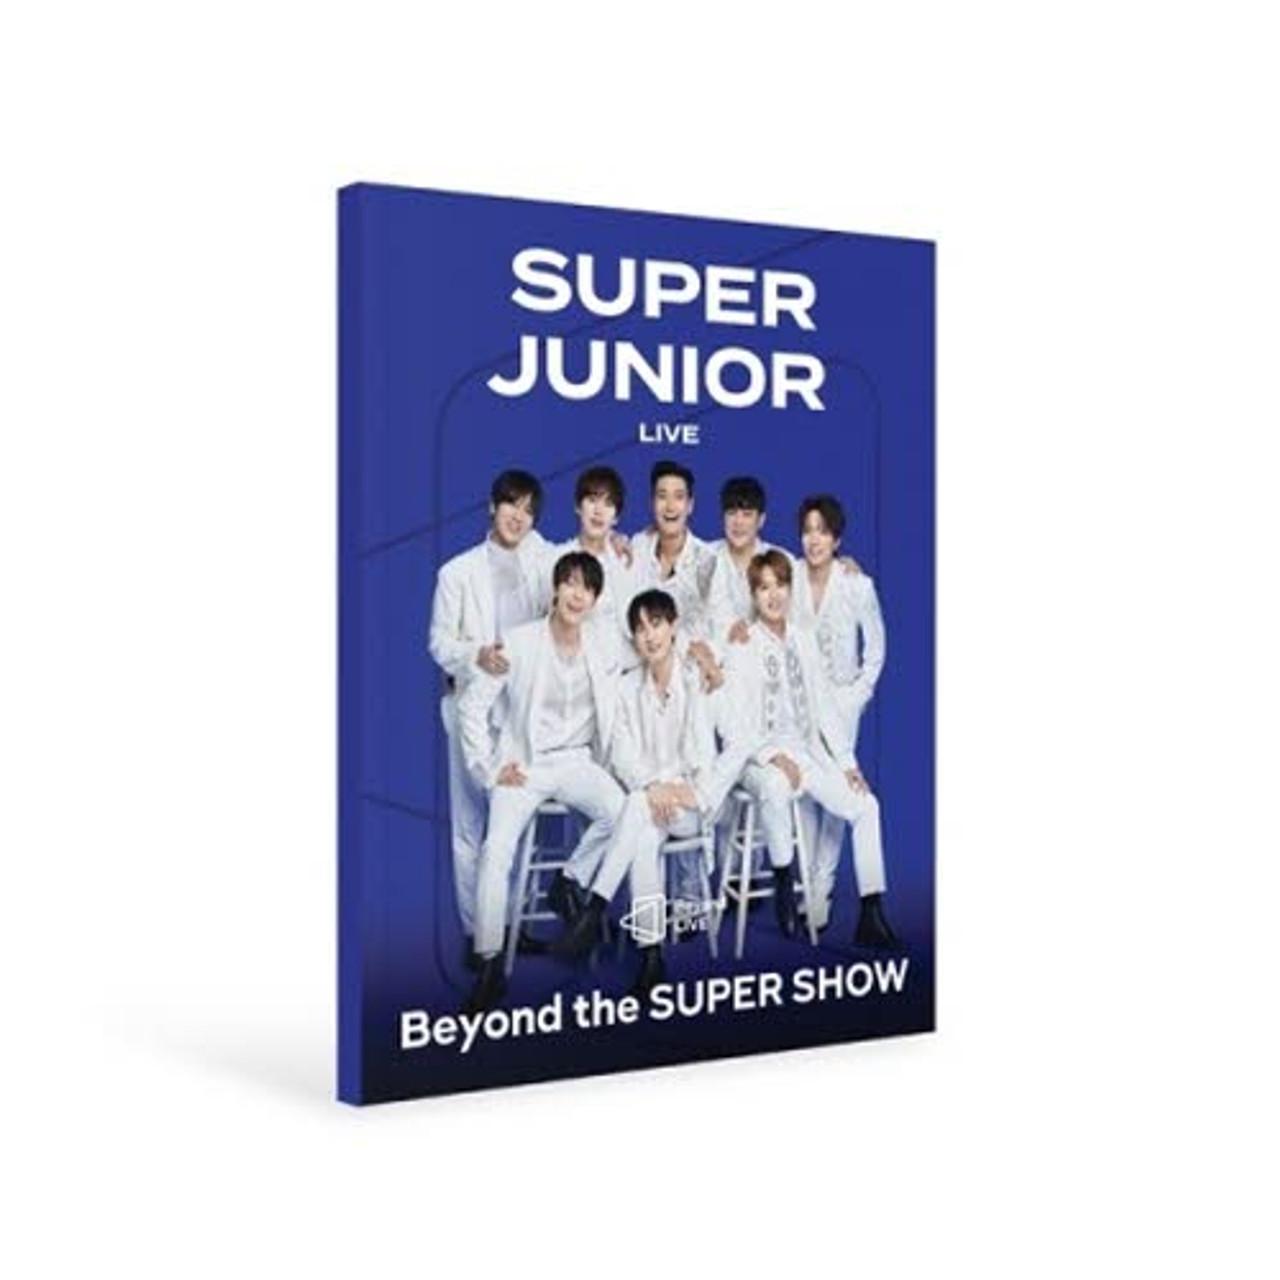 SUPER JUNIOR -Beyond LIVE BROCHURE SUPER JUNIOR [Beyond the SUPER SHOW]